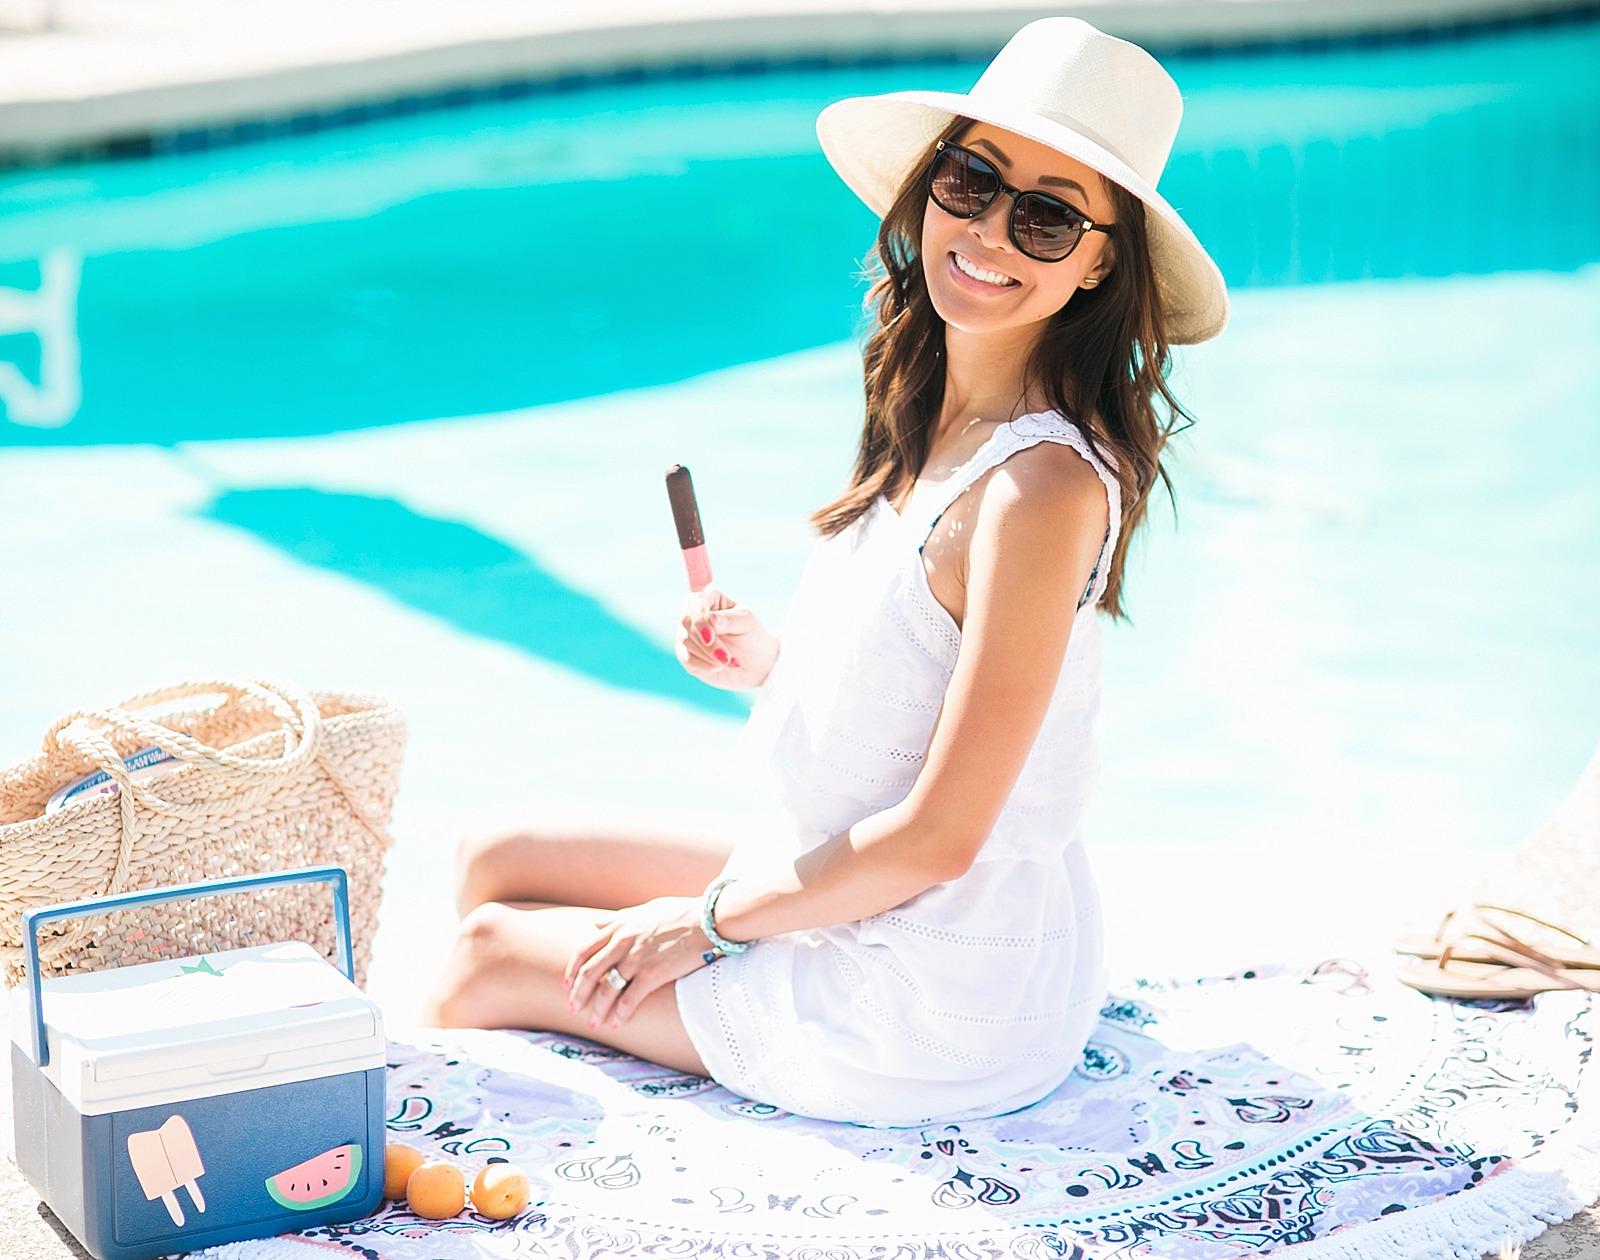 weight-watchers-pool-ready-summer-photoshoot-pool-shoot-model-lifestyle-blogger-arizona-phoenix-diana-elizabeth-blog-_0035